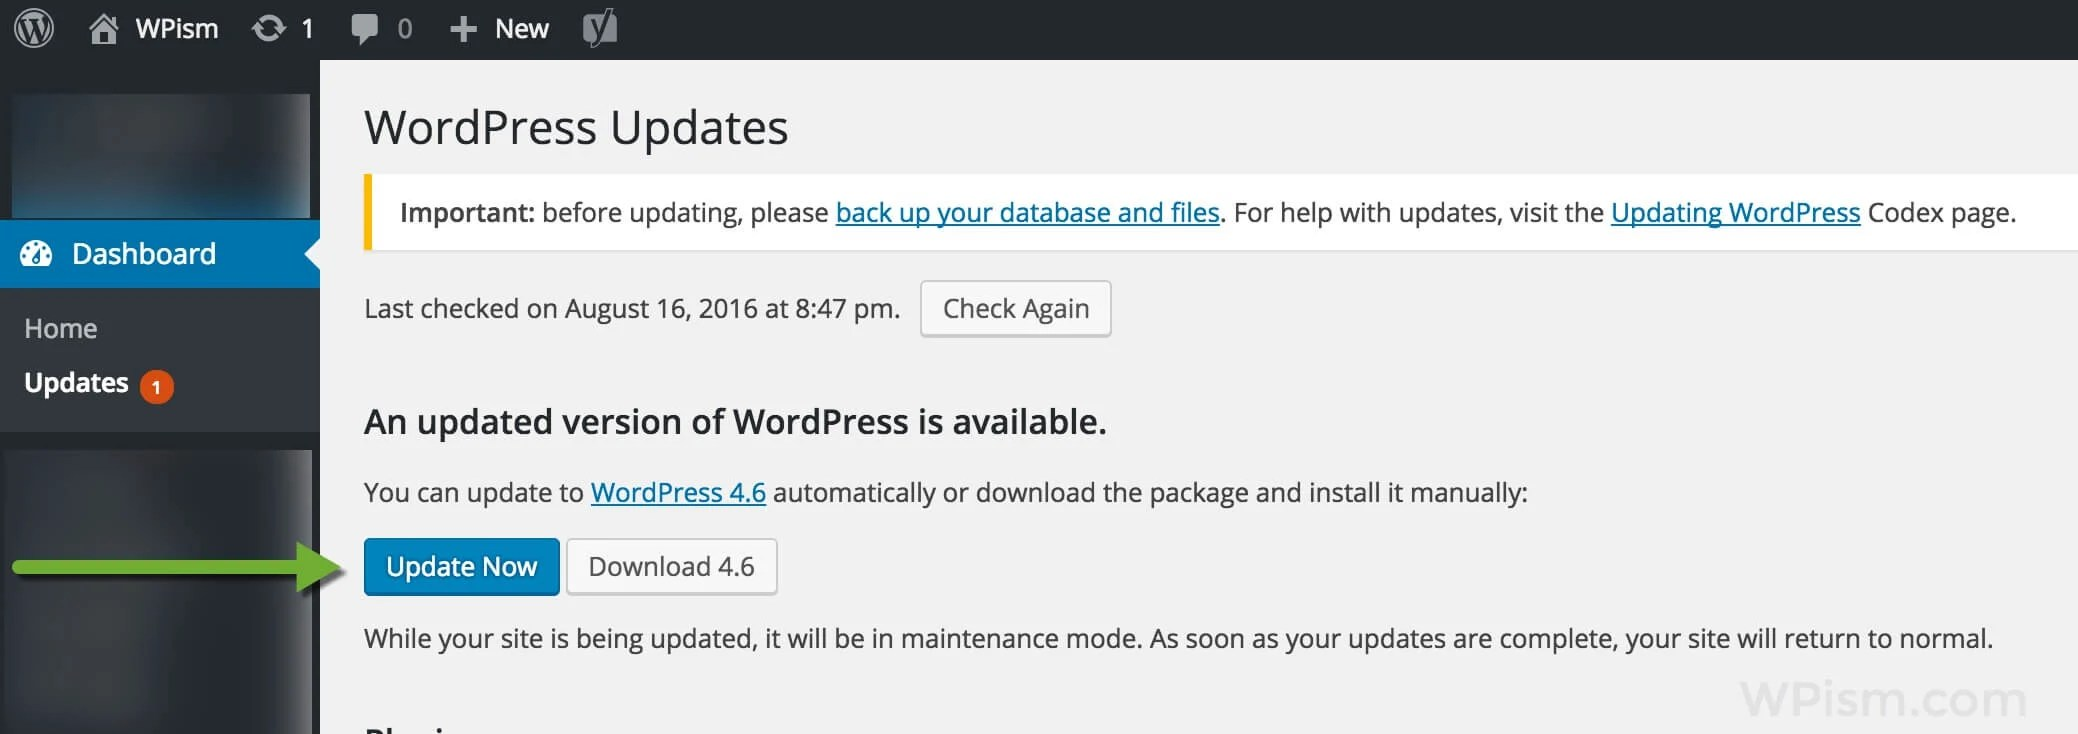 WordPress 4.6 Update Screen